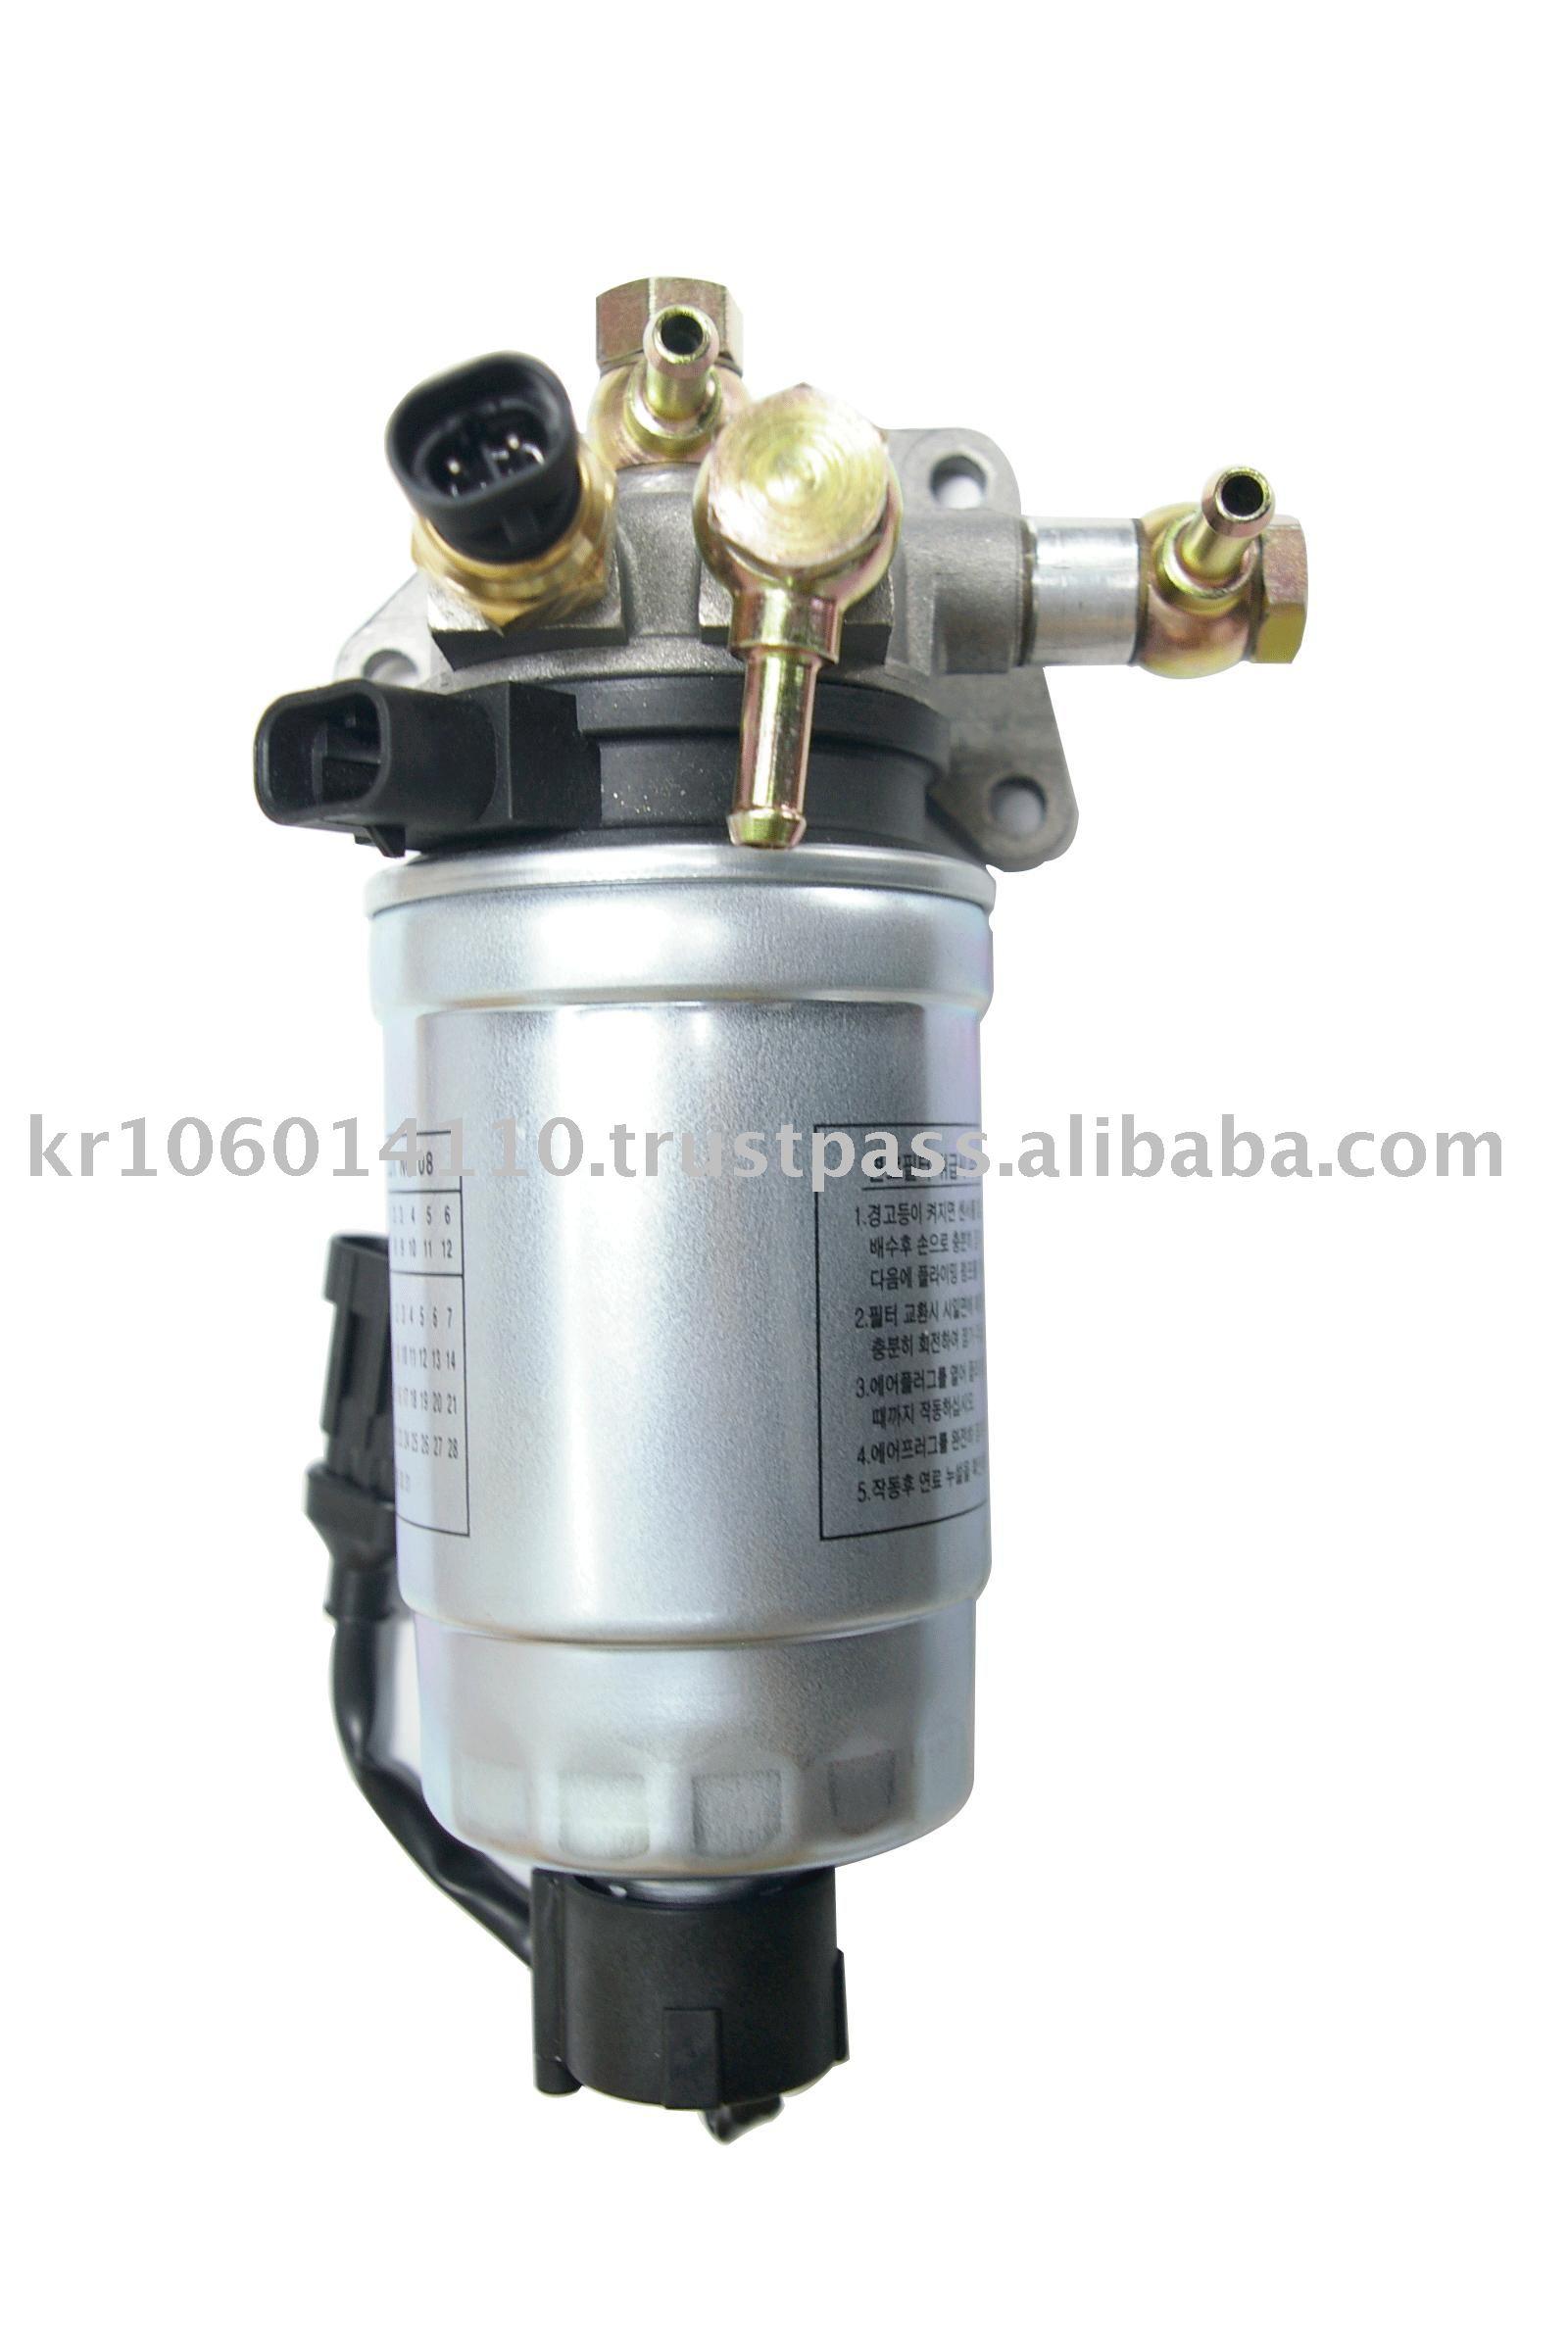 hight resolution of crdi fuel filter grand starex hyundai buy fuel filter crdi